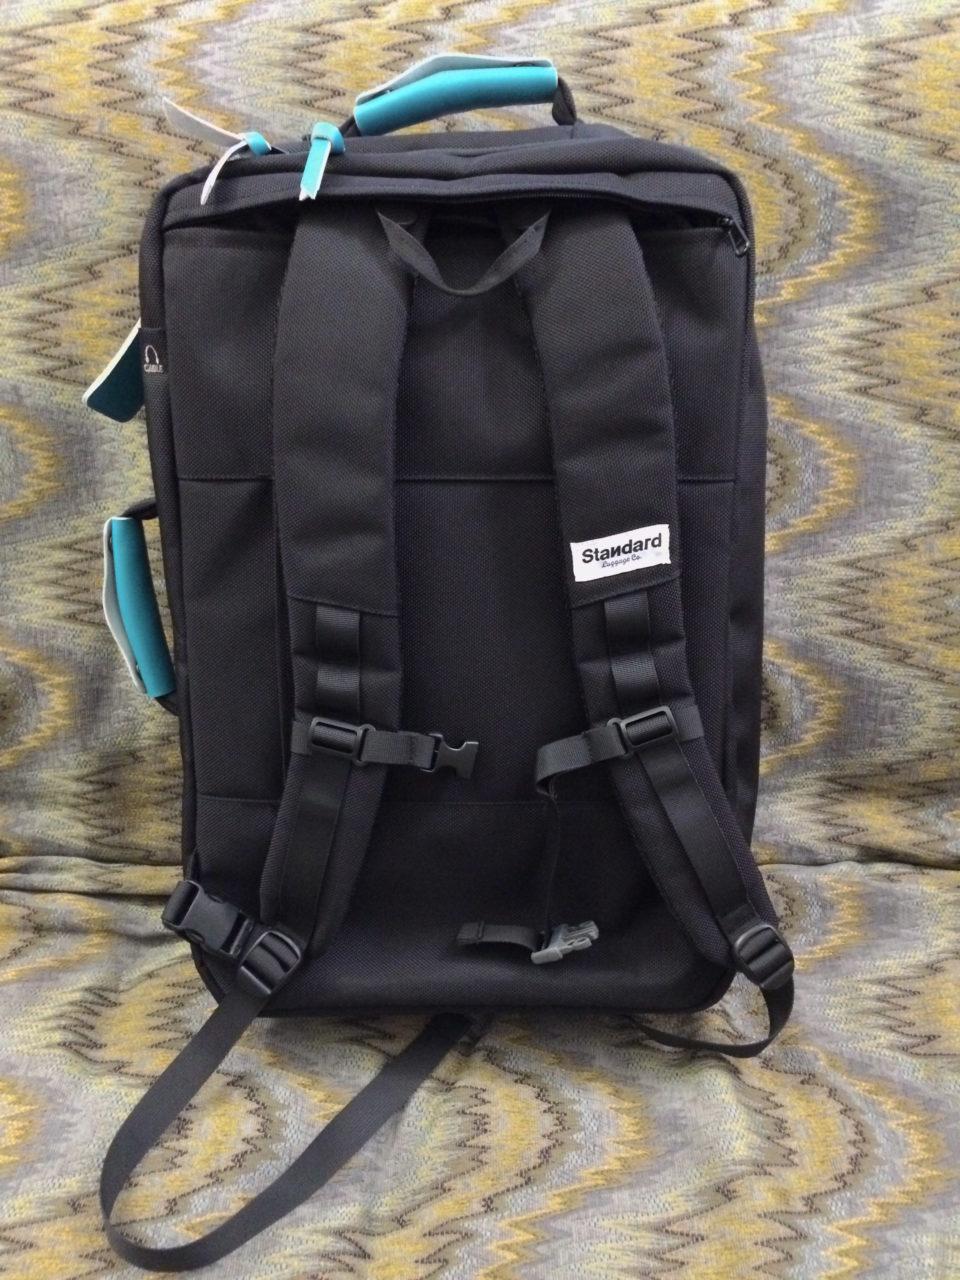 Standard Luggage backpack straps